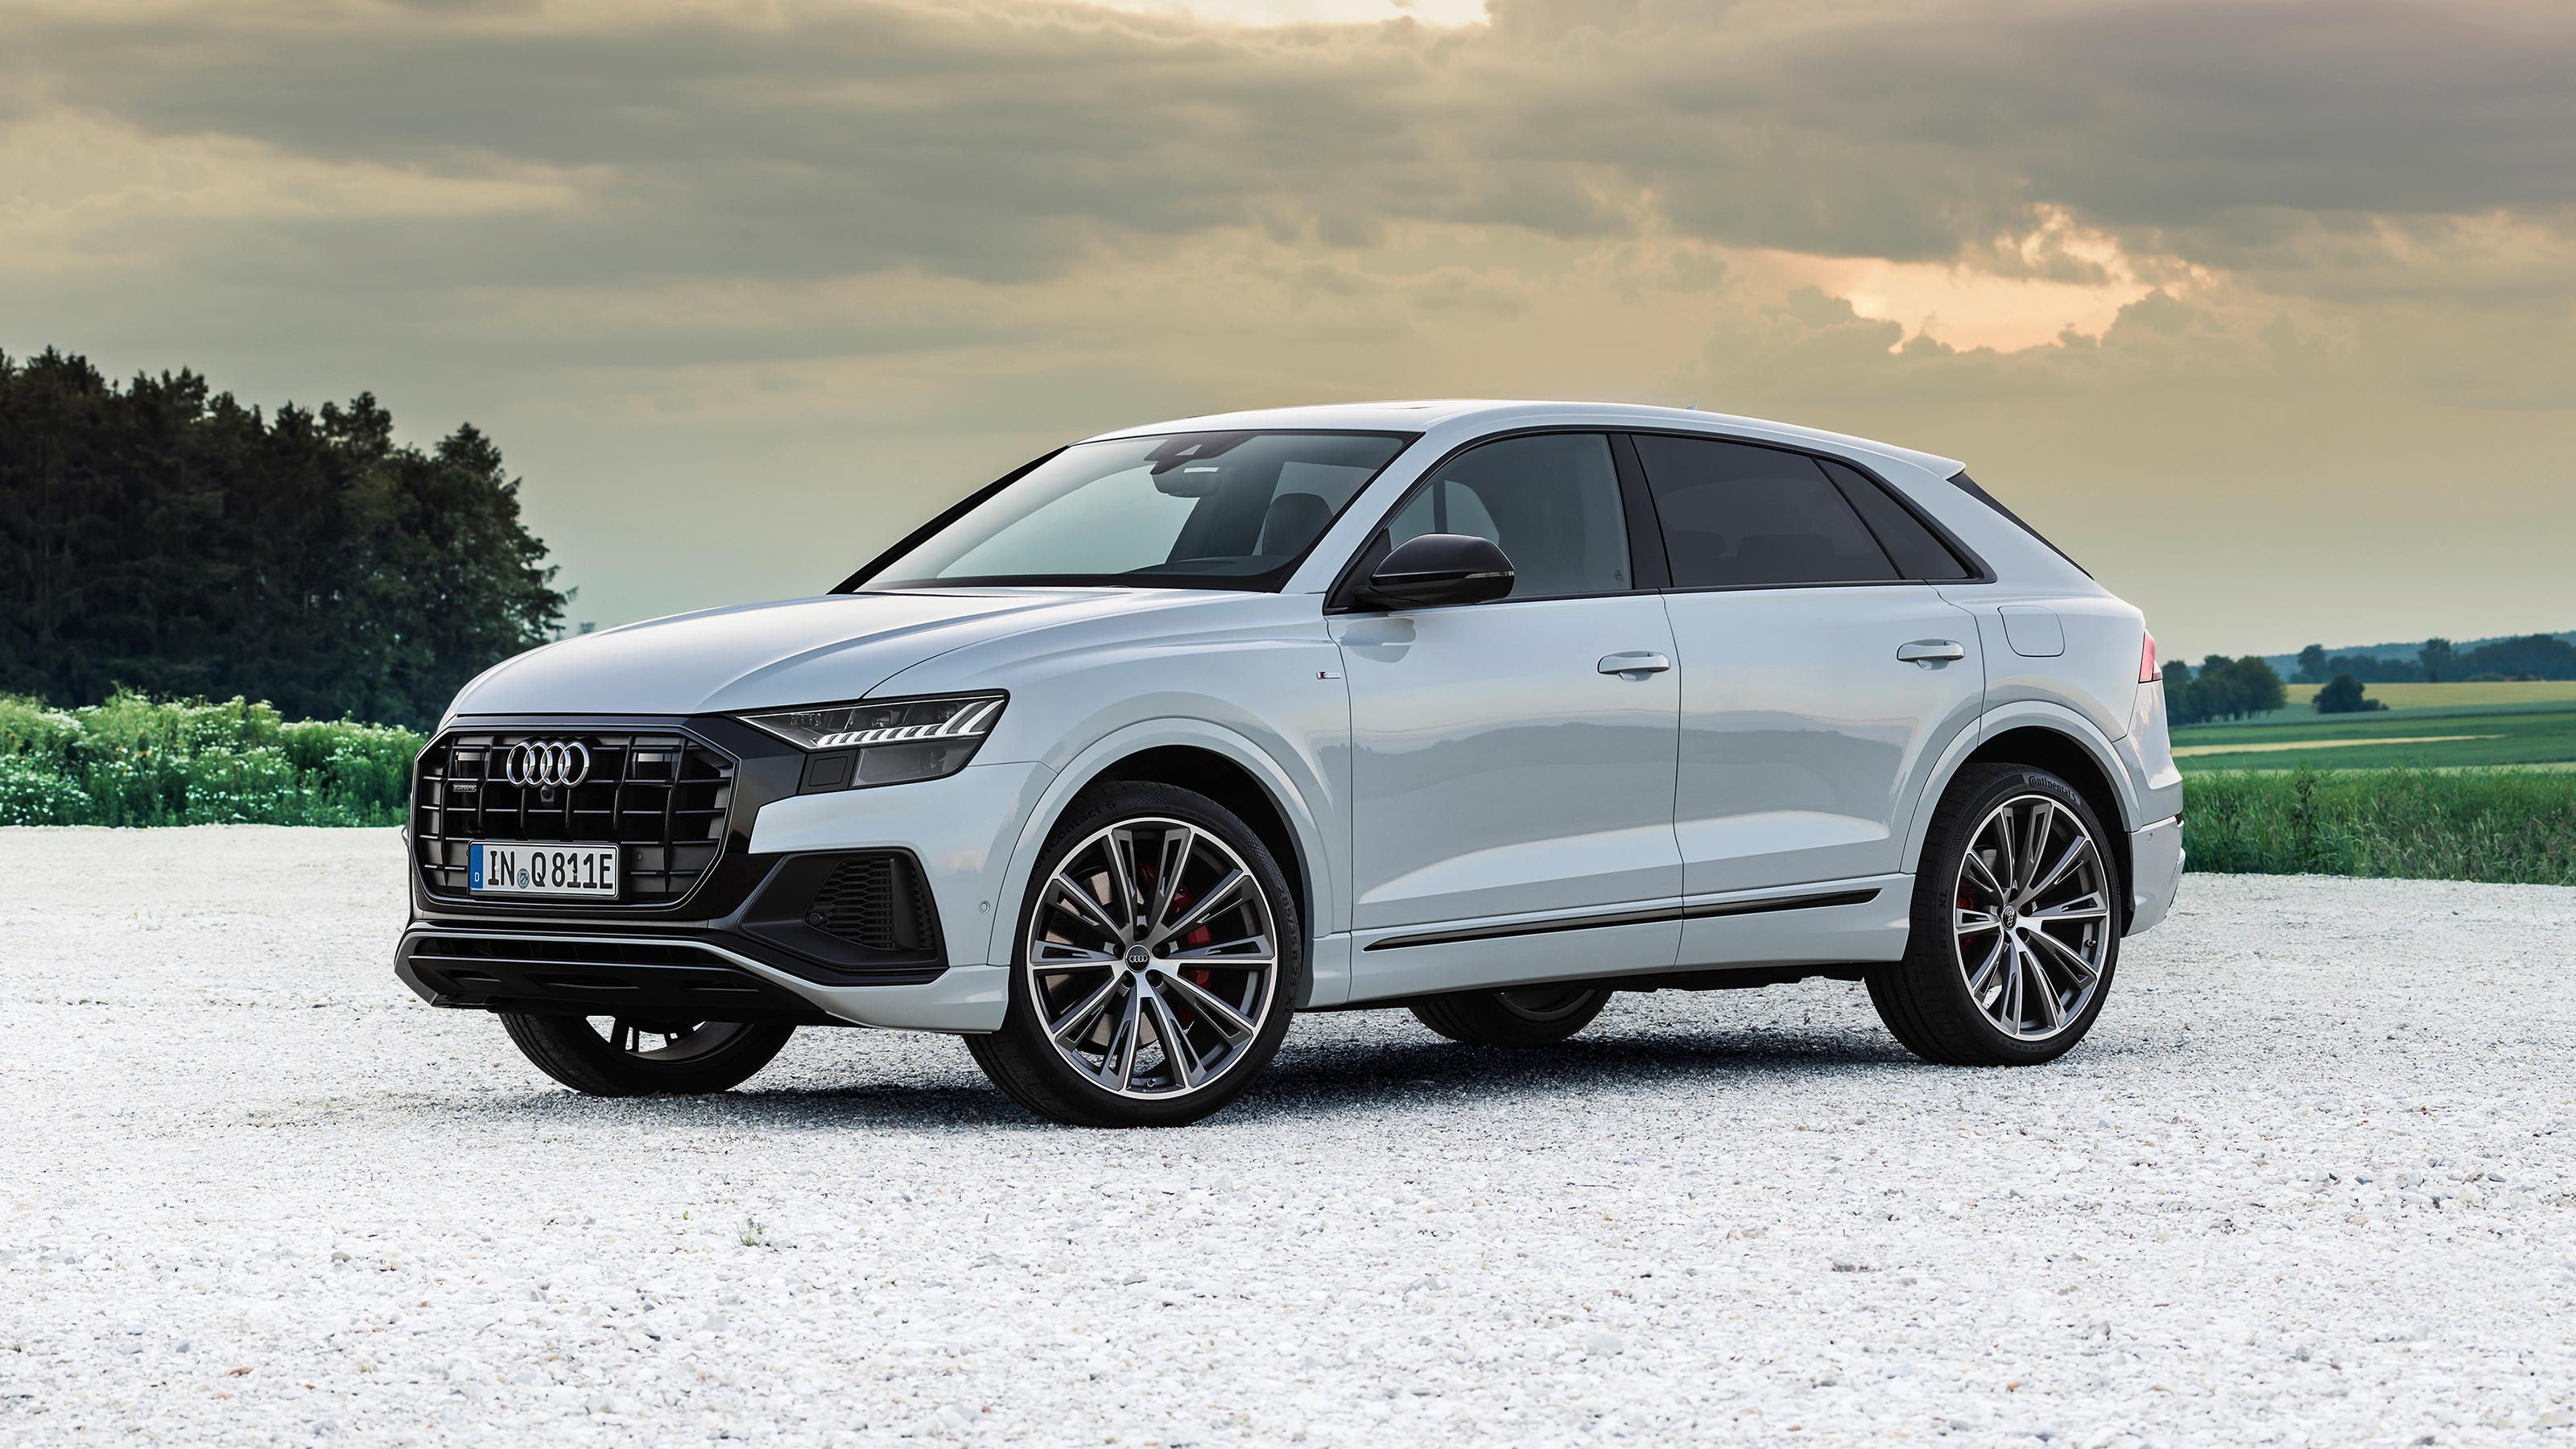 Kekurangan Audi Q8 Harga